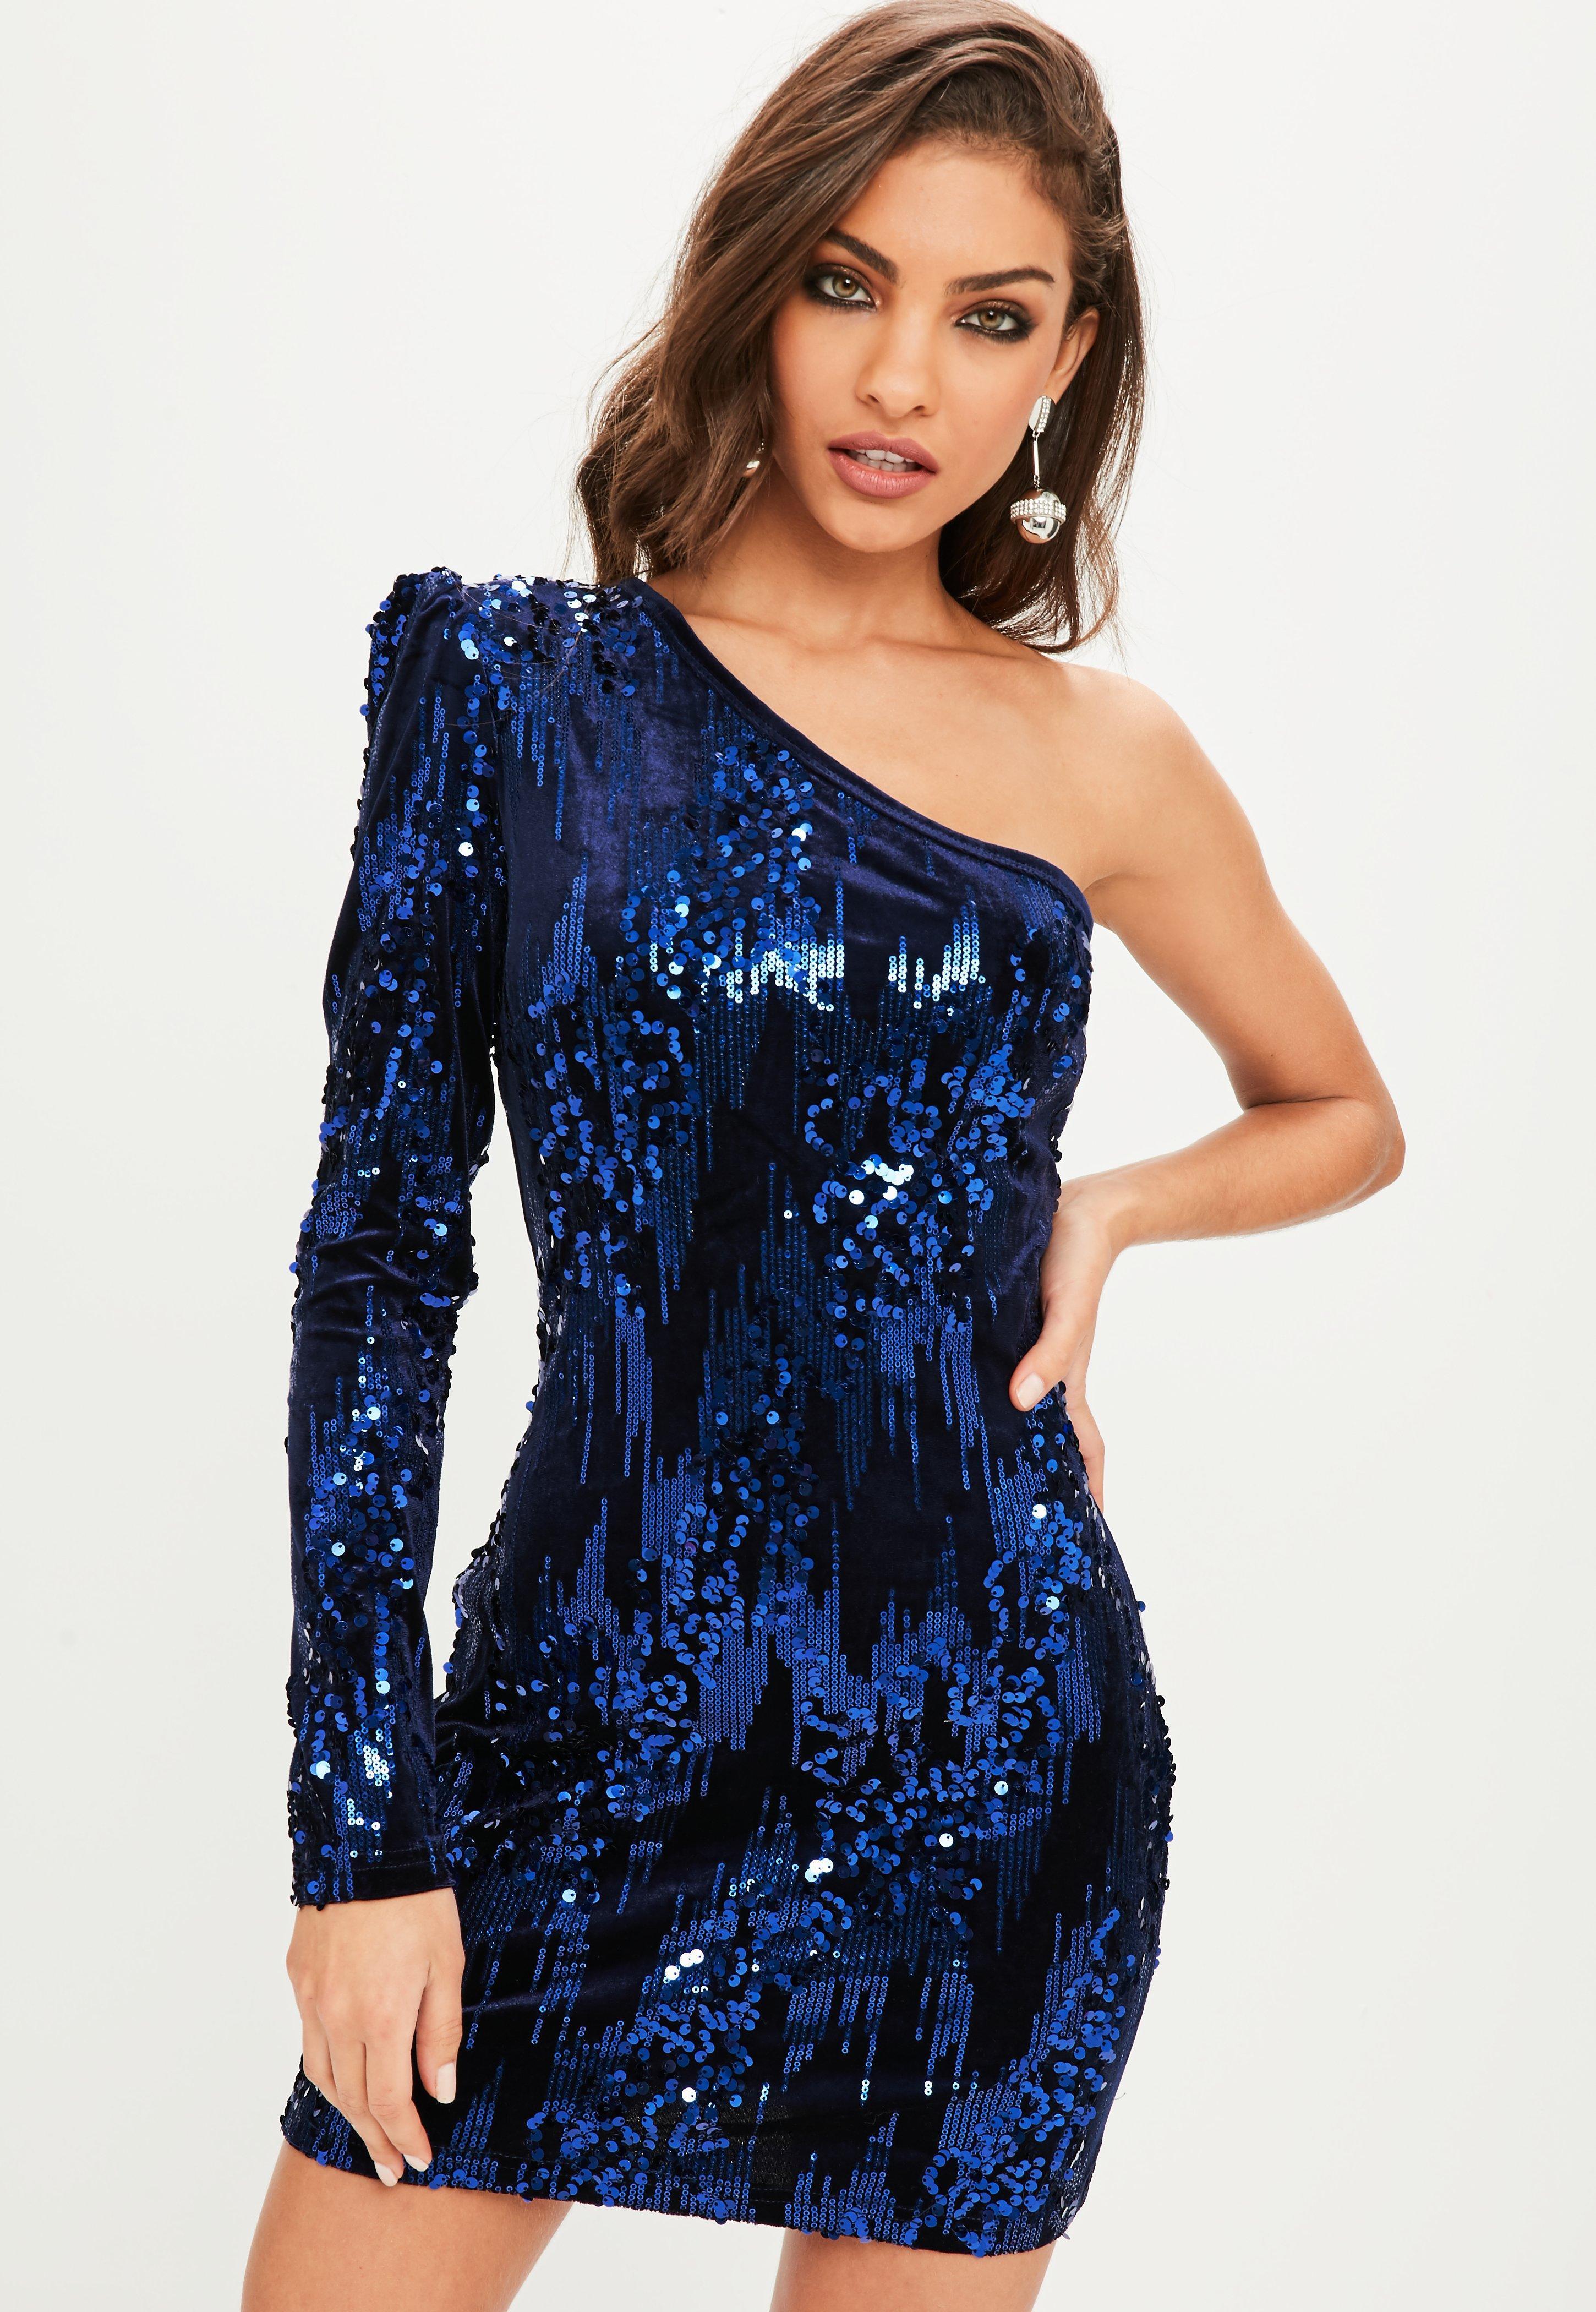 Aliexpress bodycon mini glitter dress with cutouts pregnancy